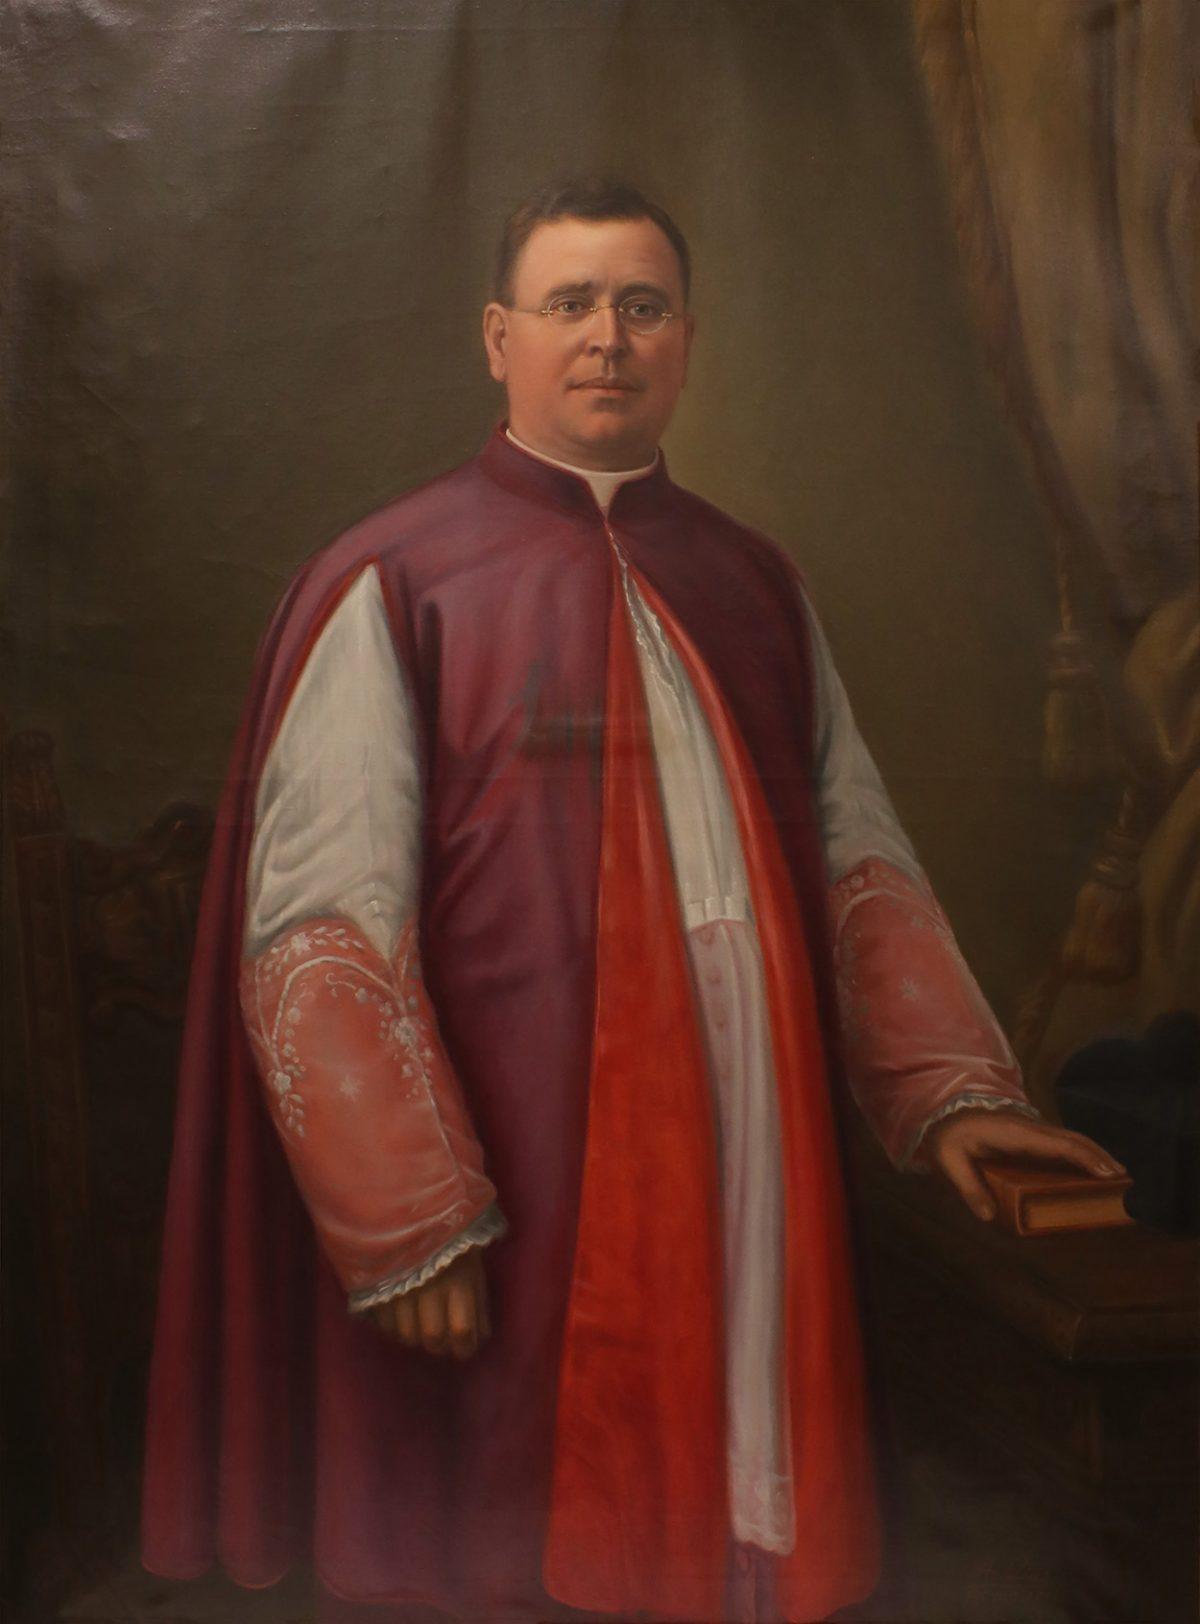 Object of the Week – Portrait of Monsignor John A. Stafford, S.T.L.